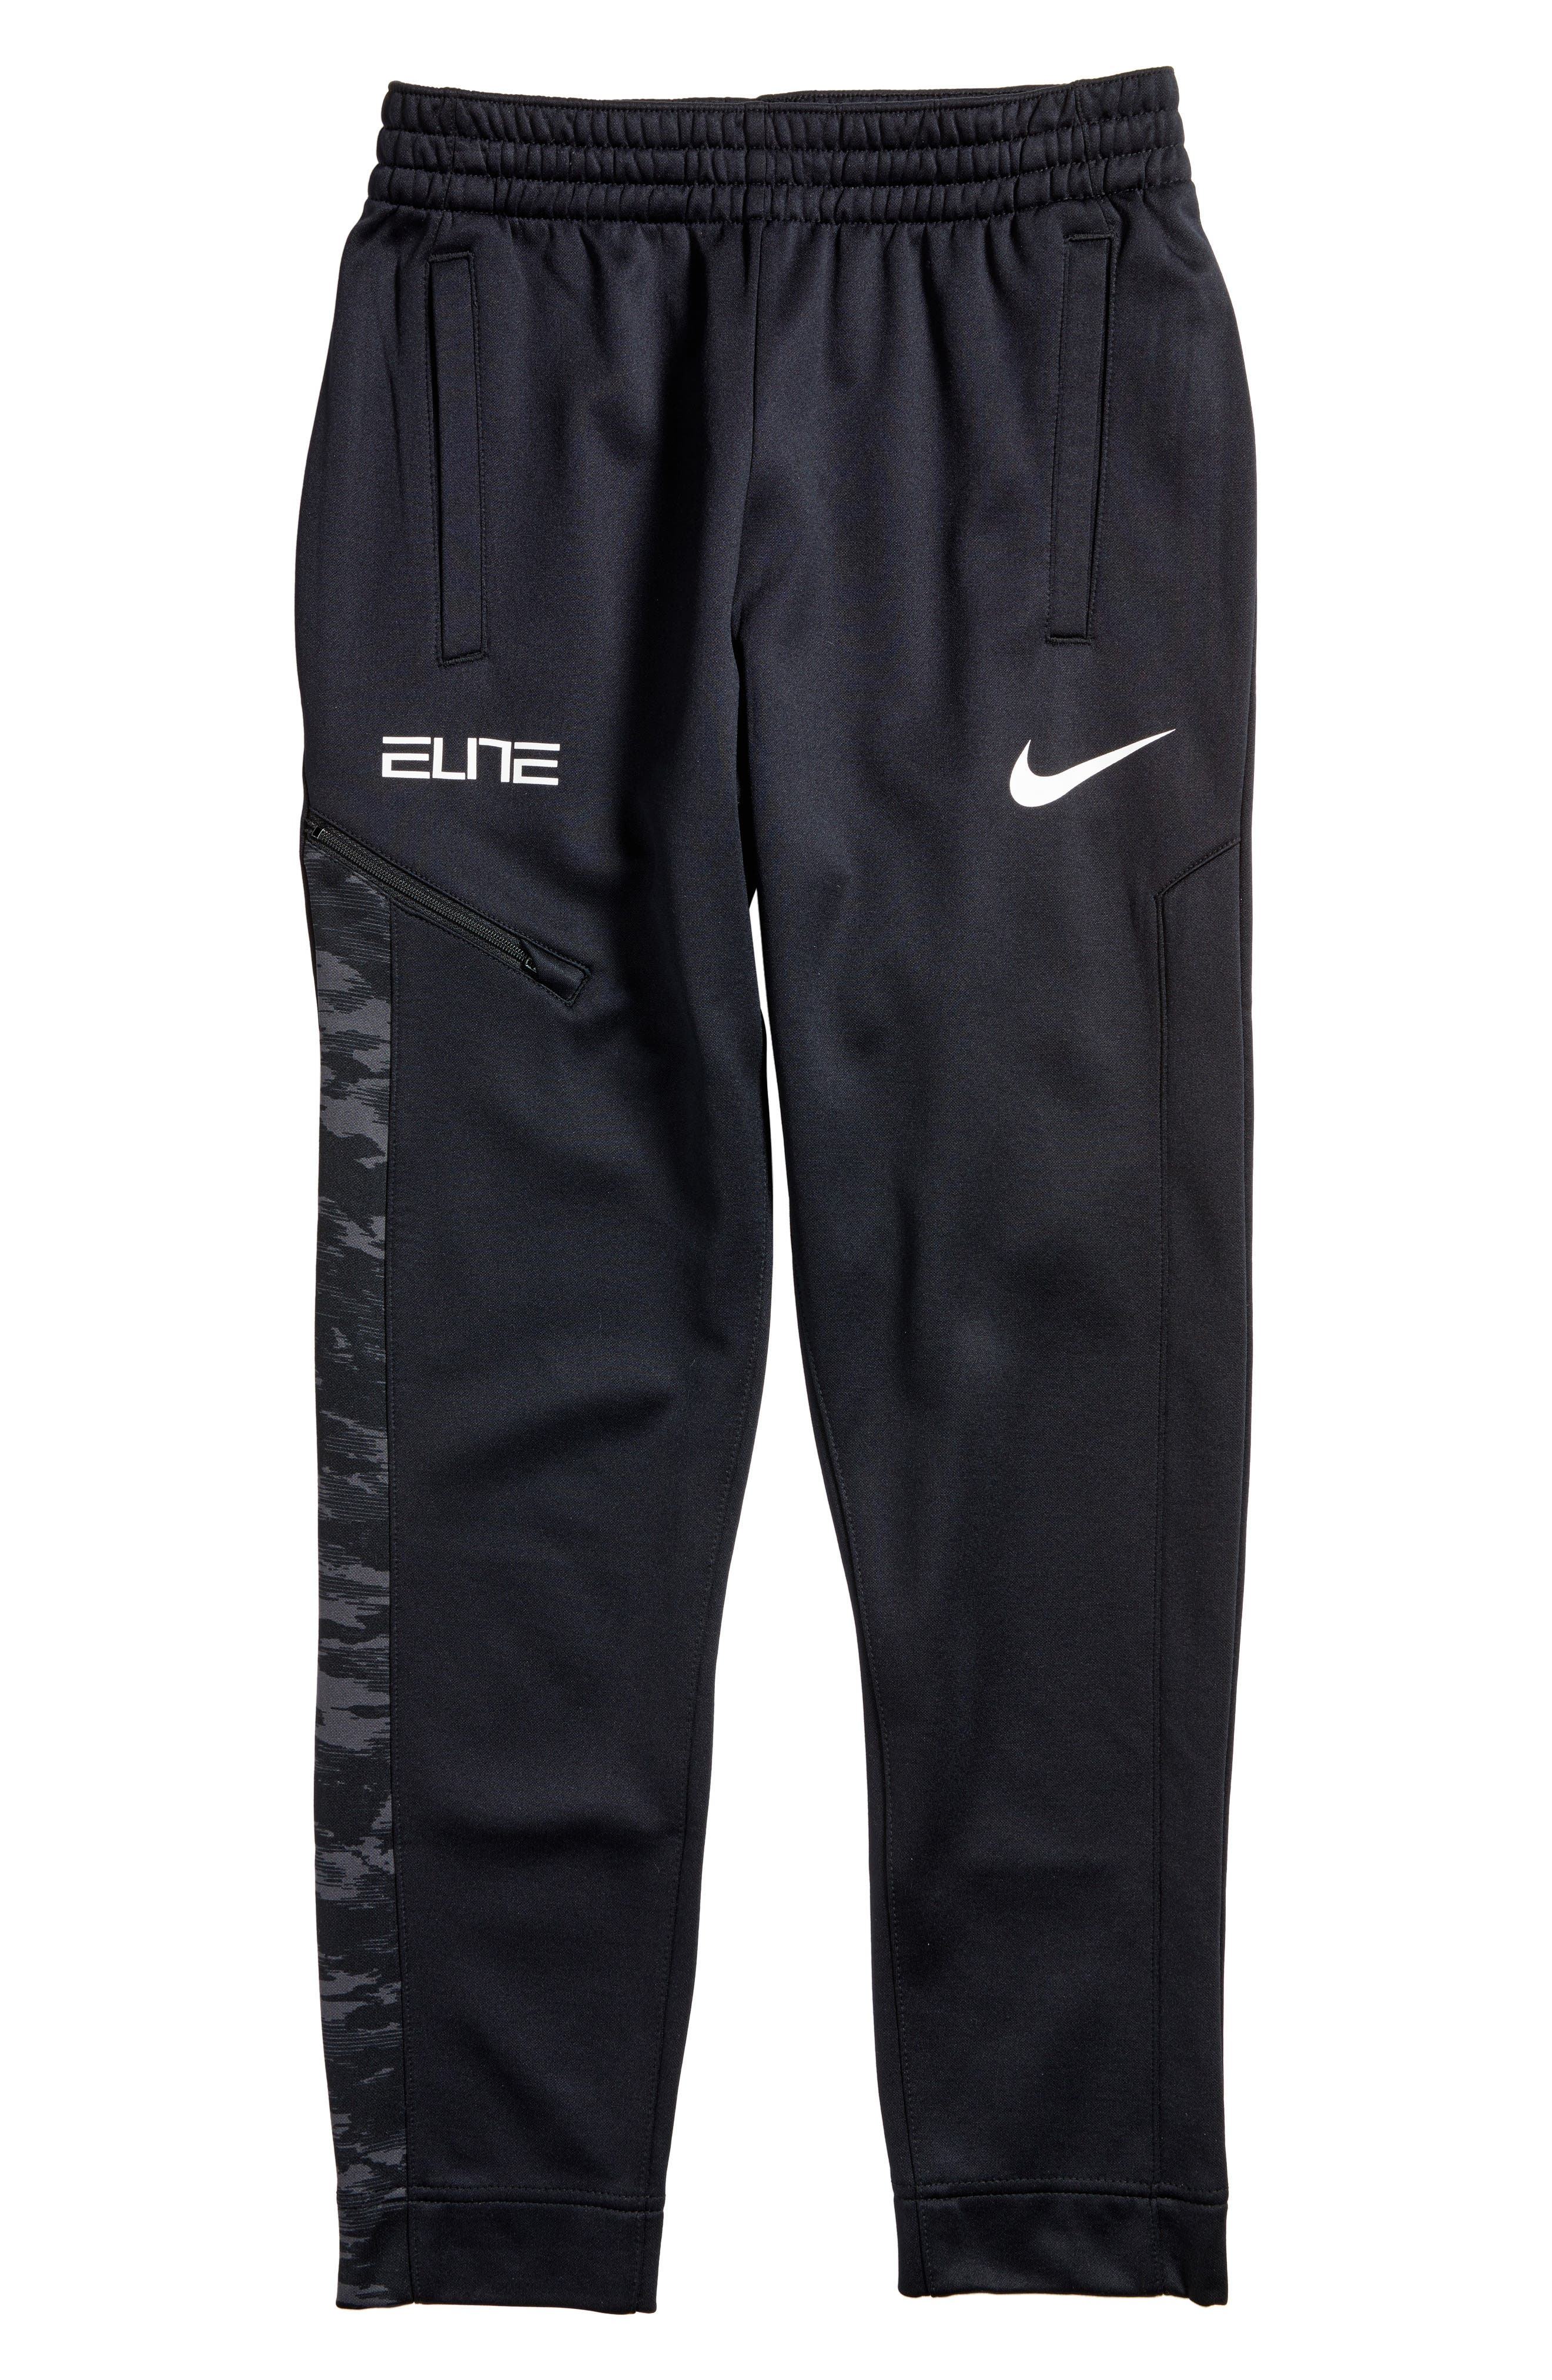 NIKE Therma Elite Pants